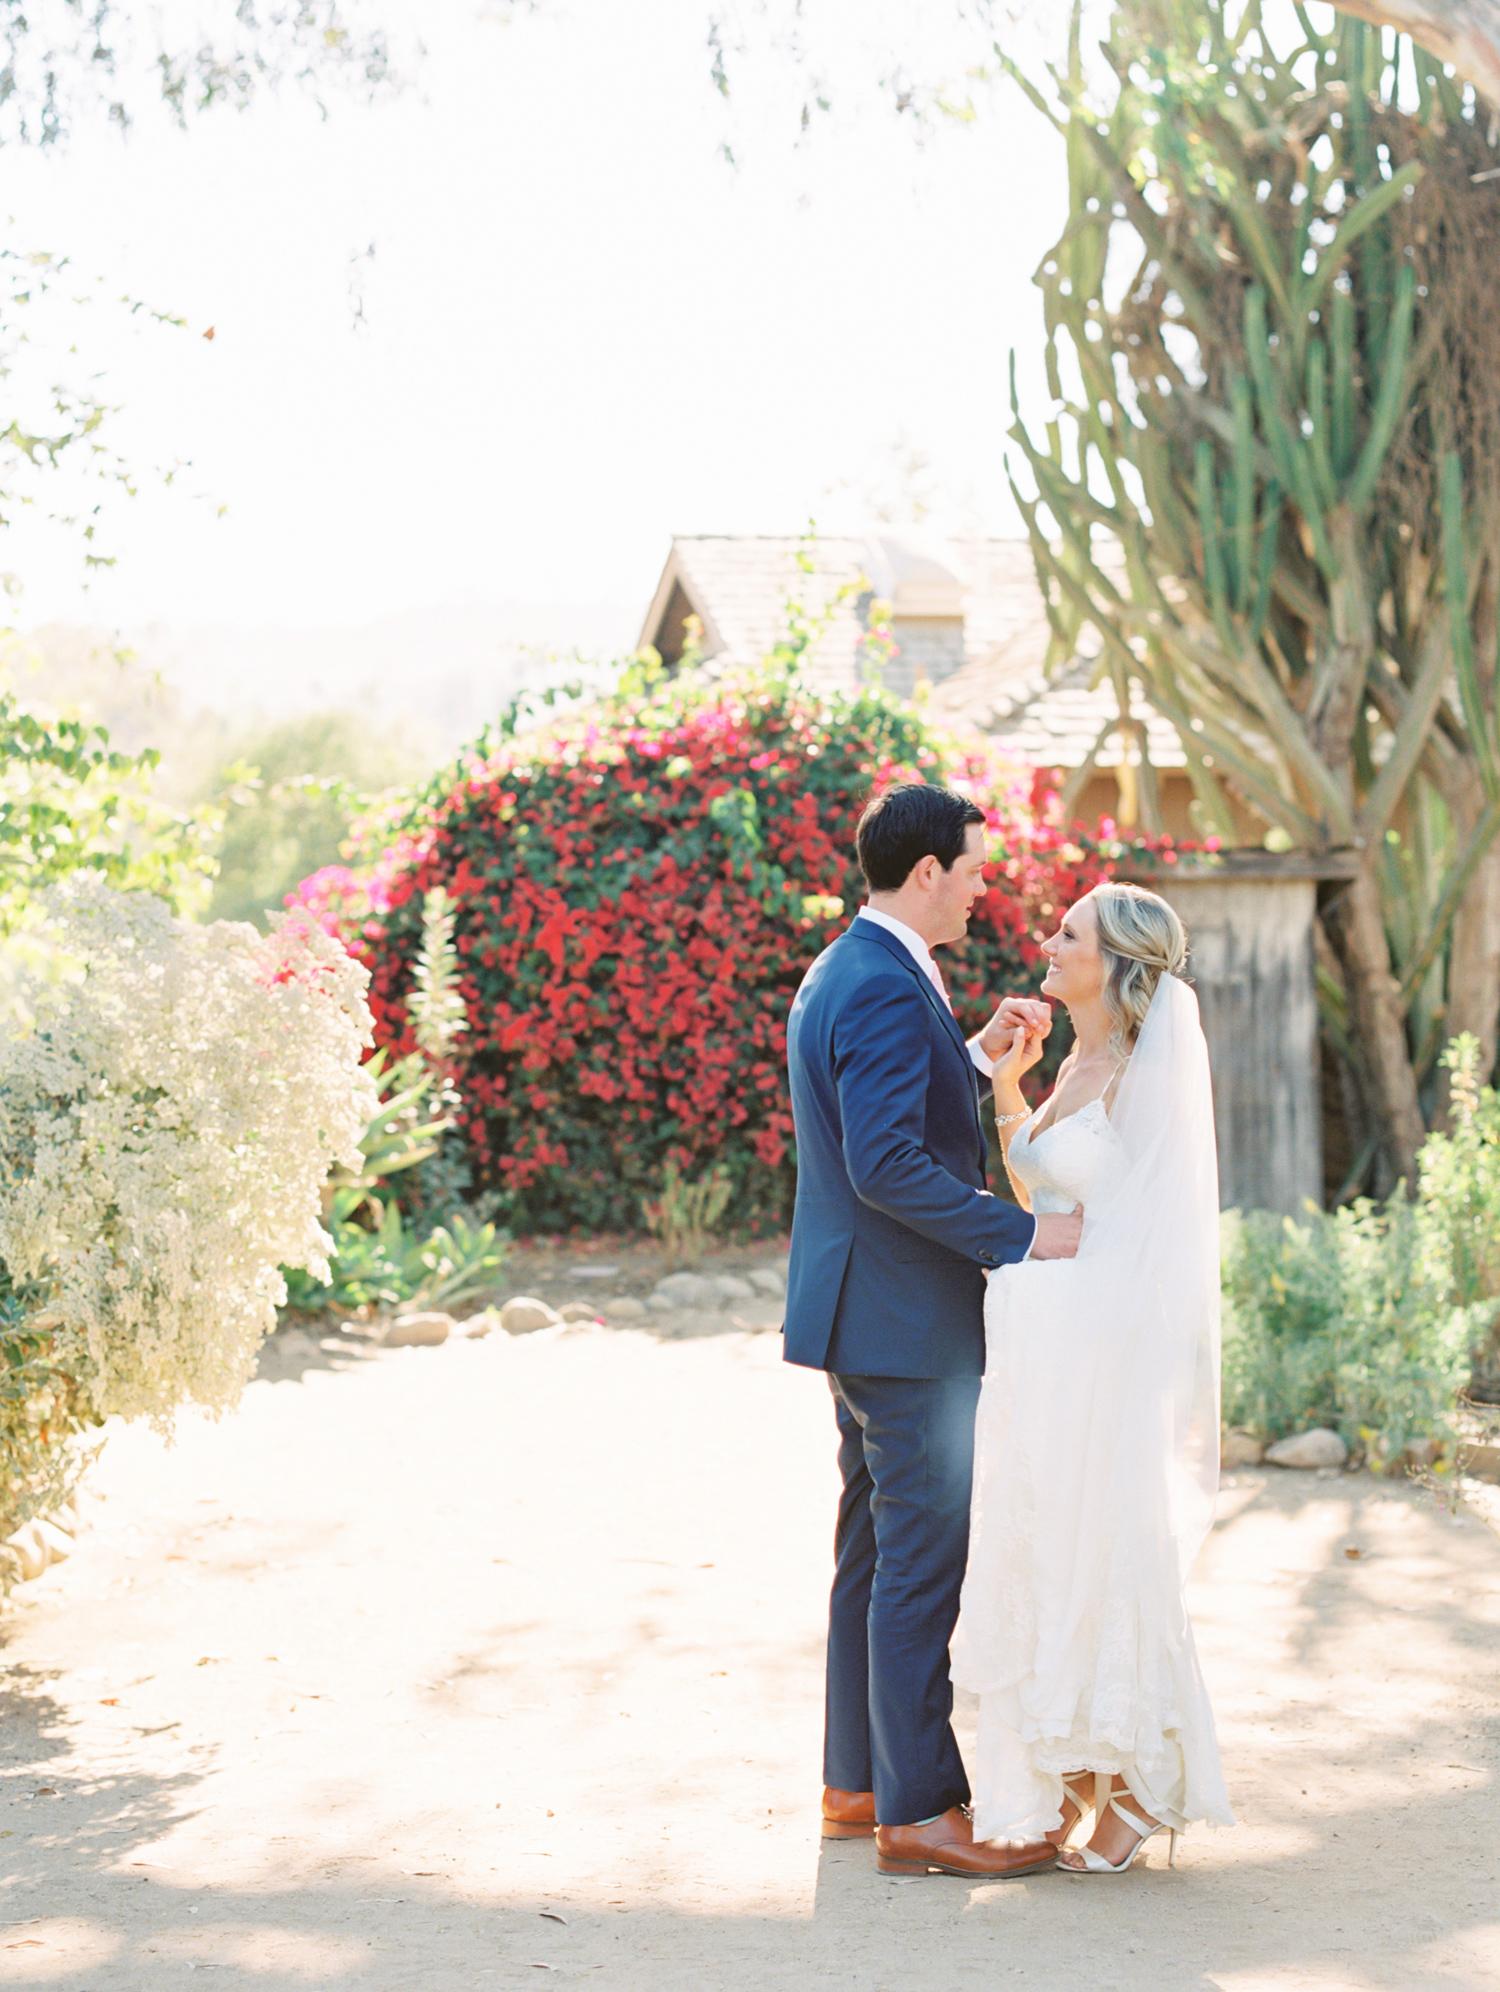 068-Jen-Wojcik-Photography-San-Diego-Wedding-Photographer.jpg